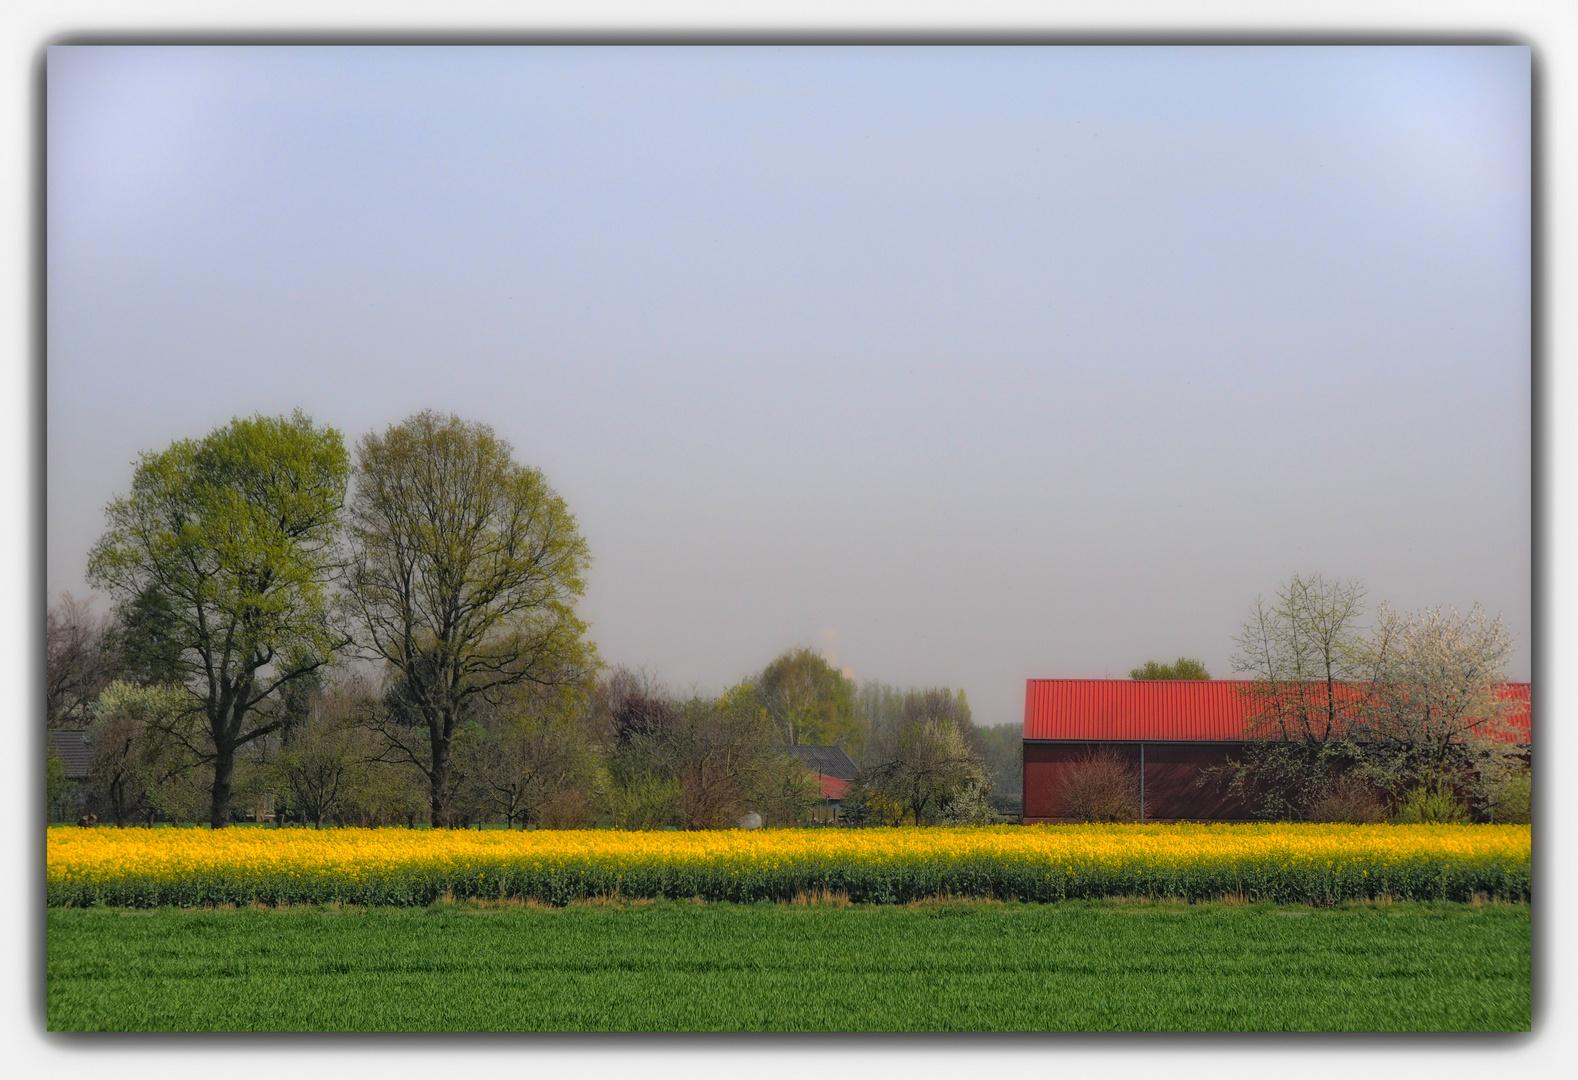 Frühling bei uns auf dem Land  II